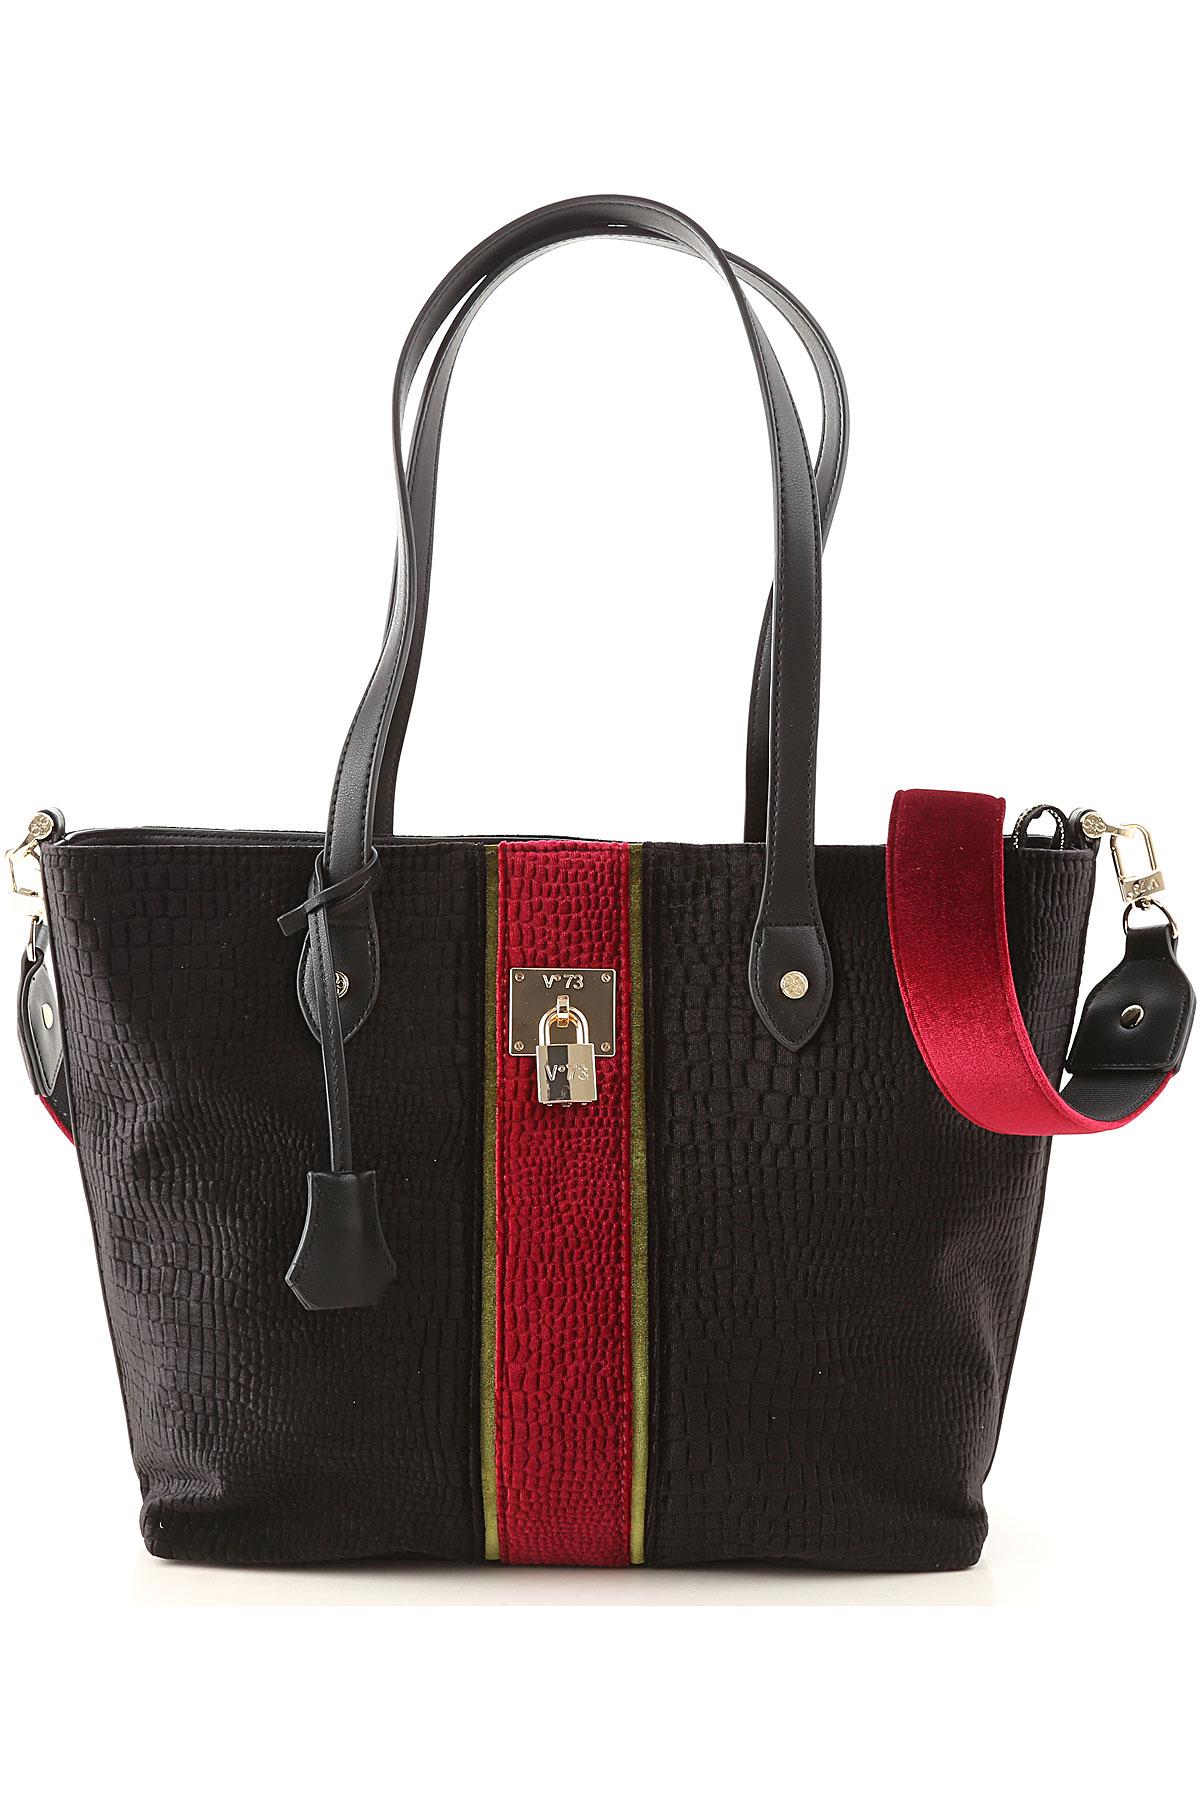 V73 Tote Bag On Sale, Black, Velvet, 2019